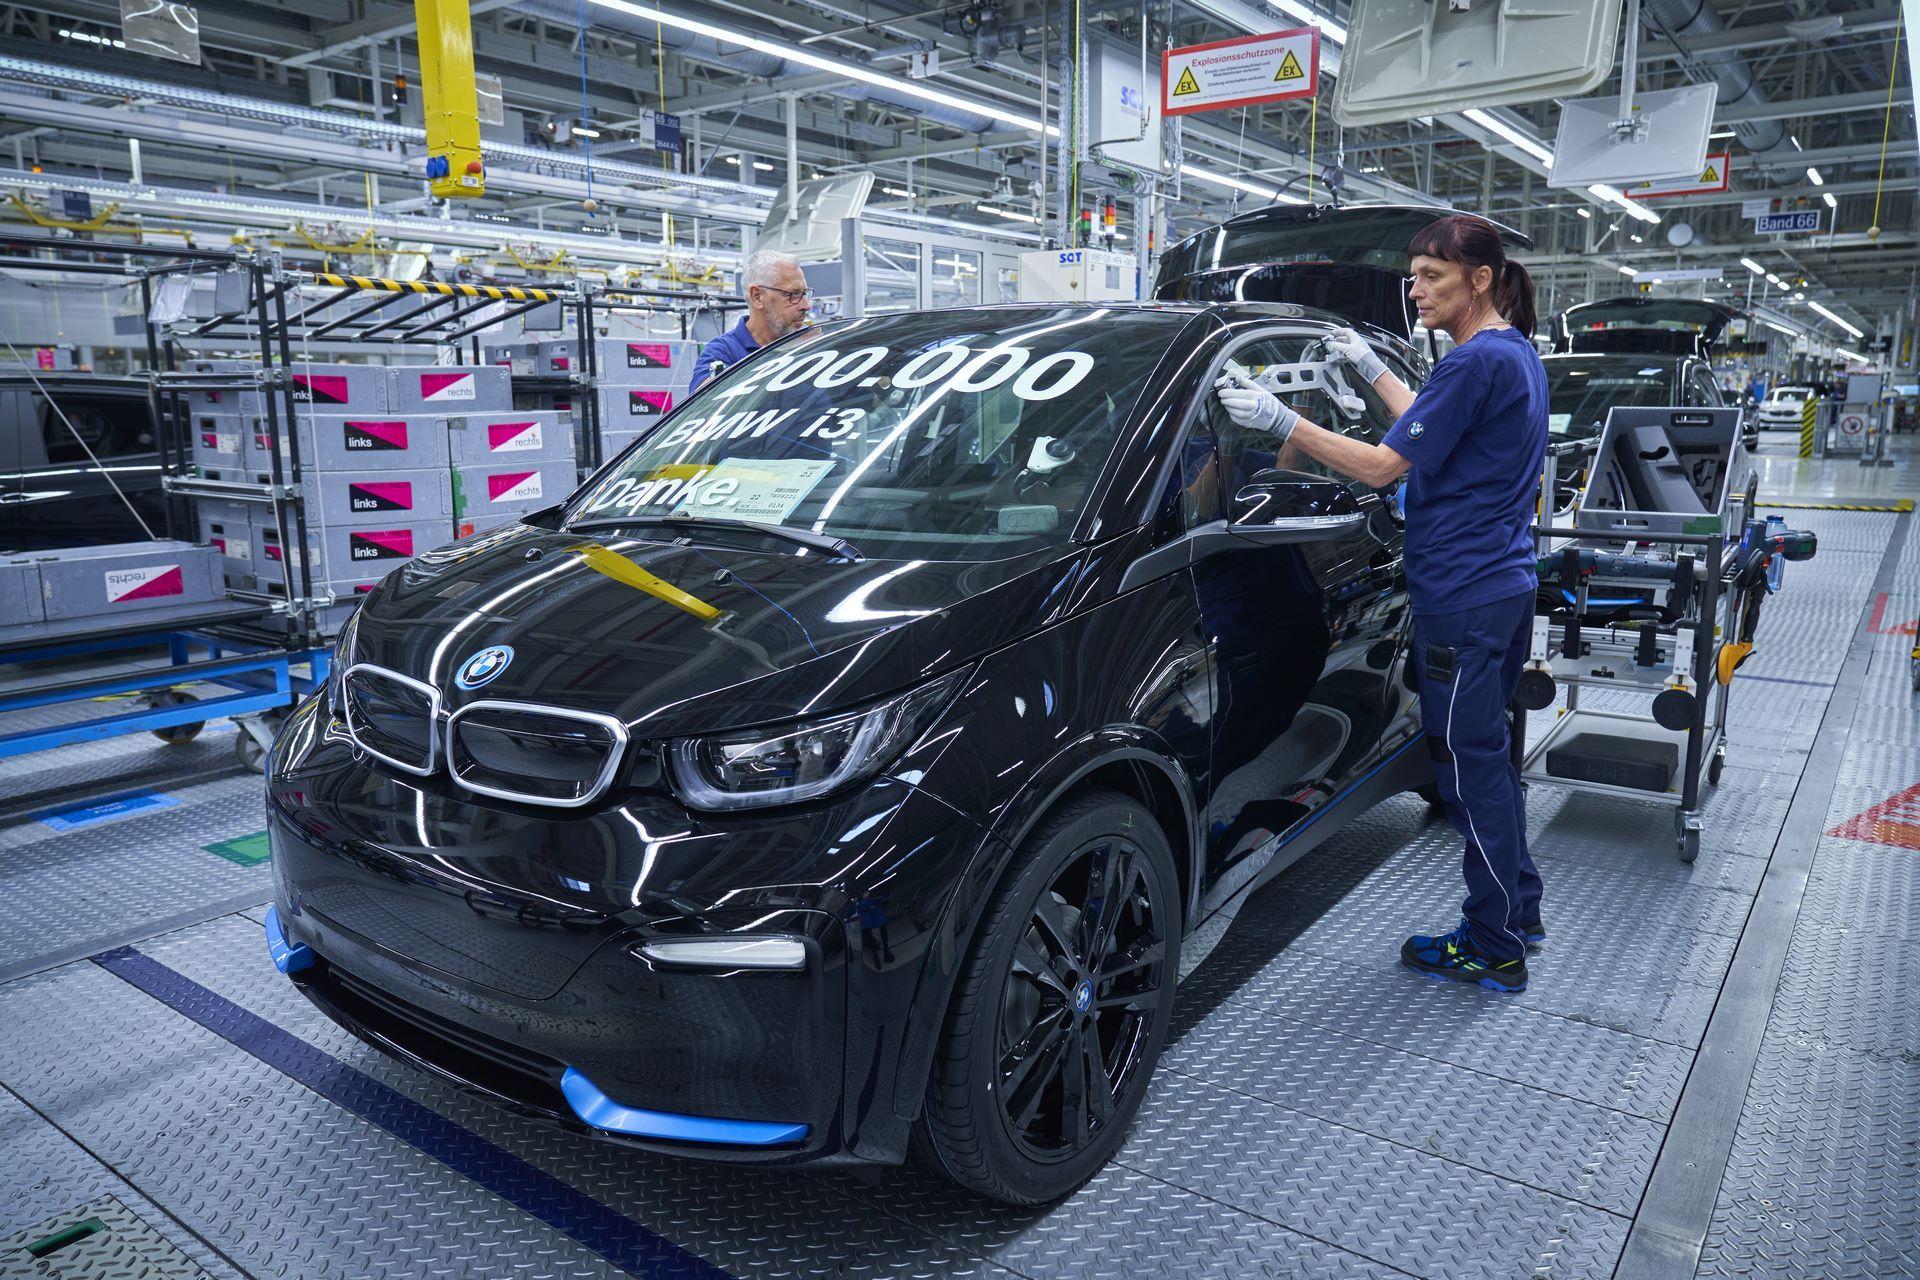 BMW-i8-plant-production-45